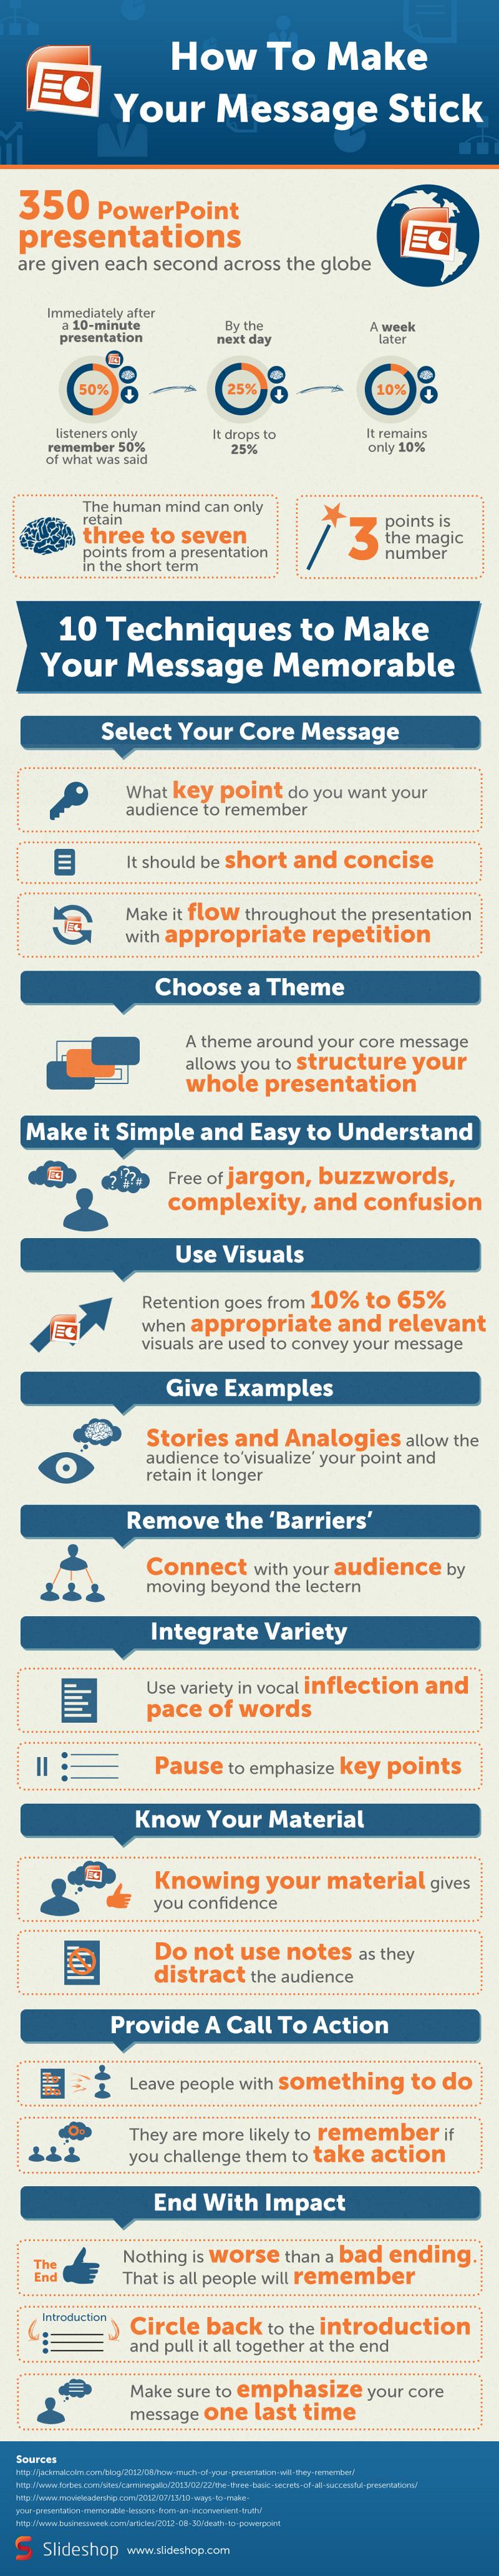 Powerpoint-Presentation-Skills